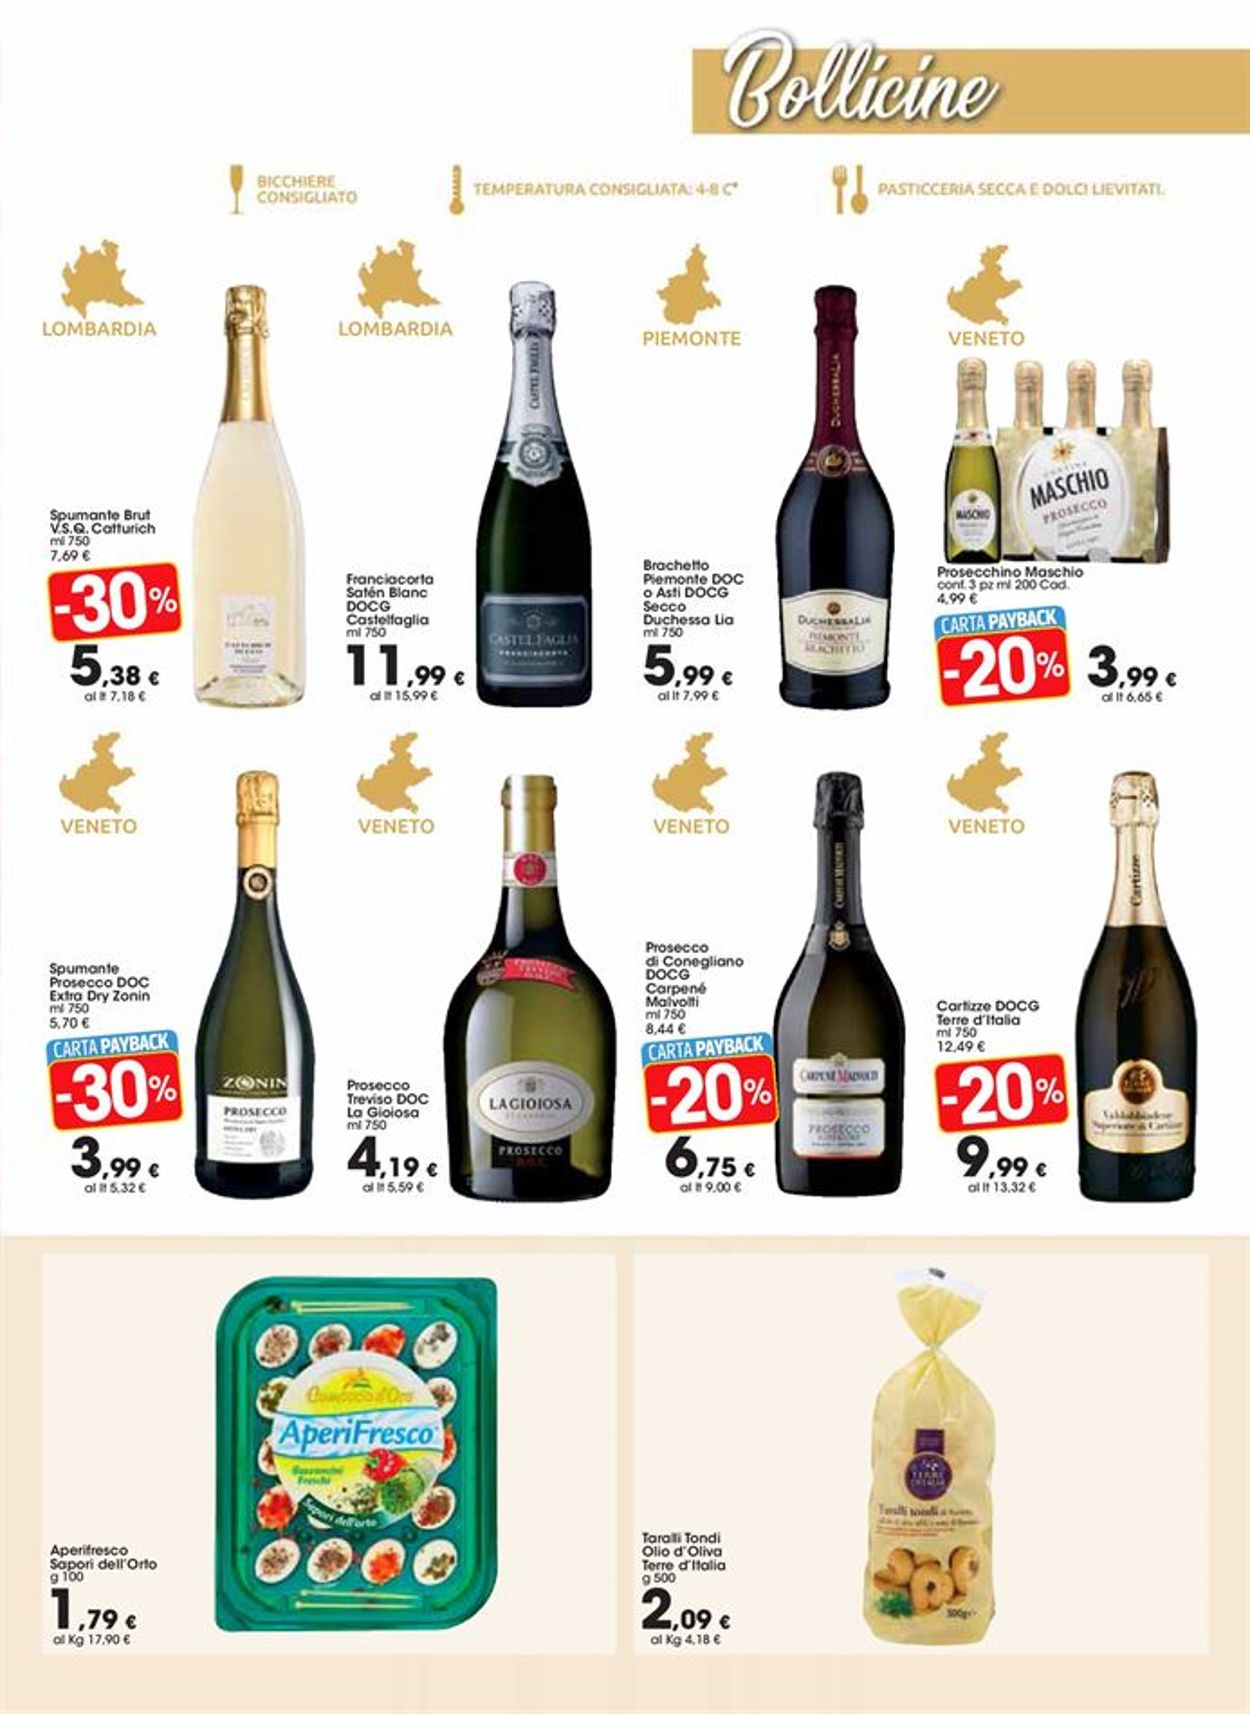 Volantino Carrefour - Offerte 13/05-29/05/2019 (Pagina 3)